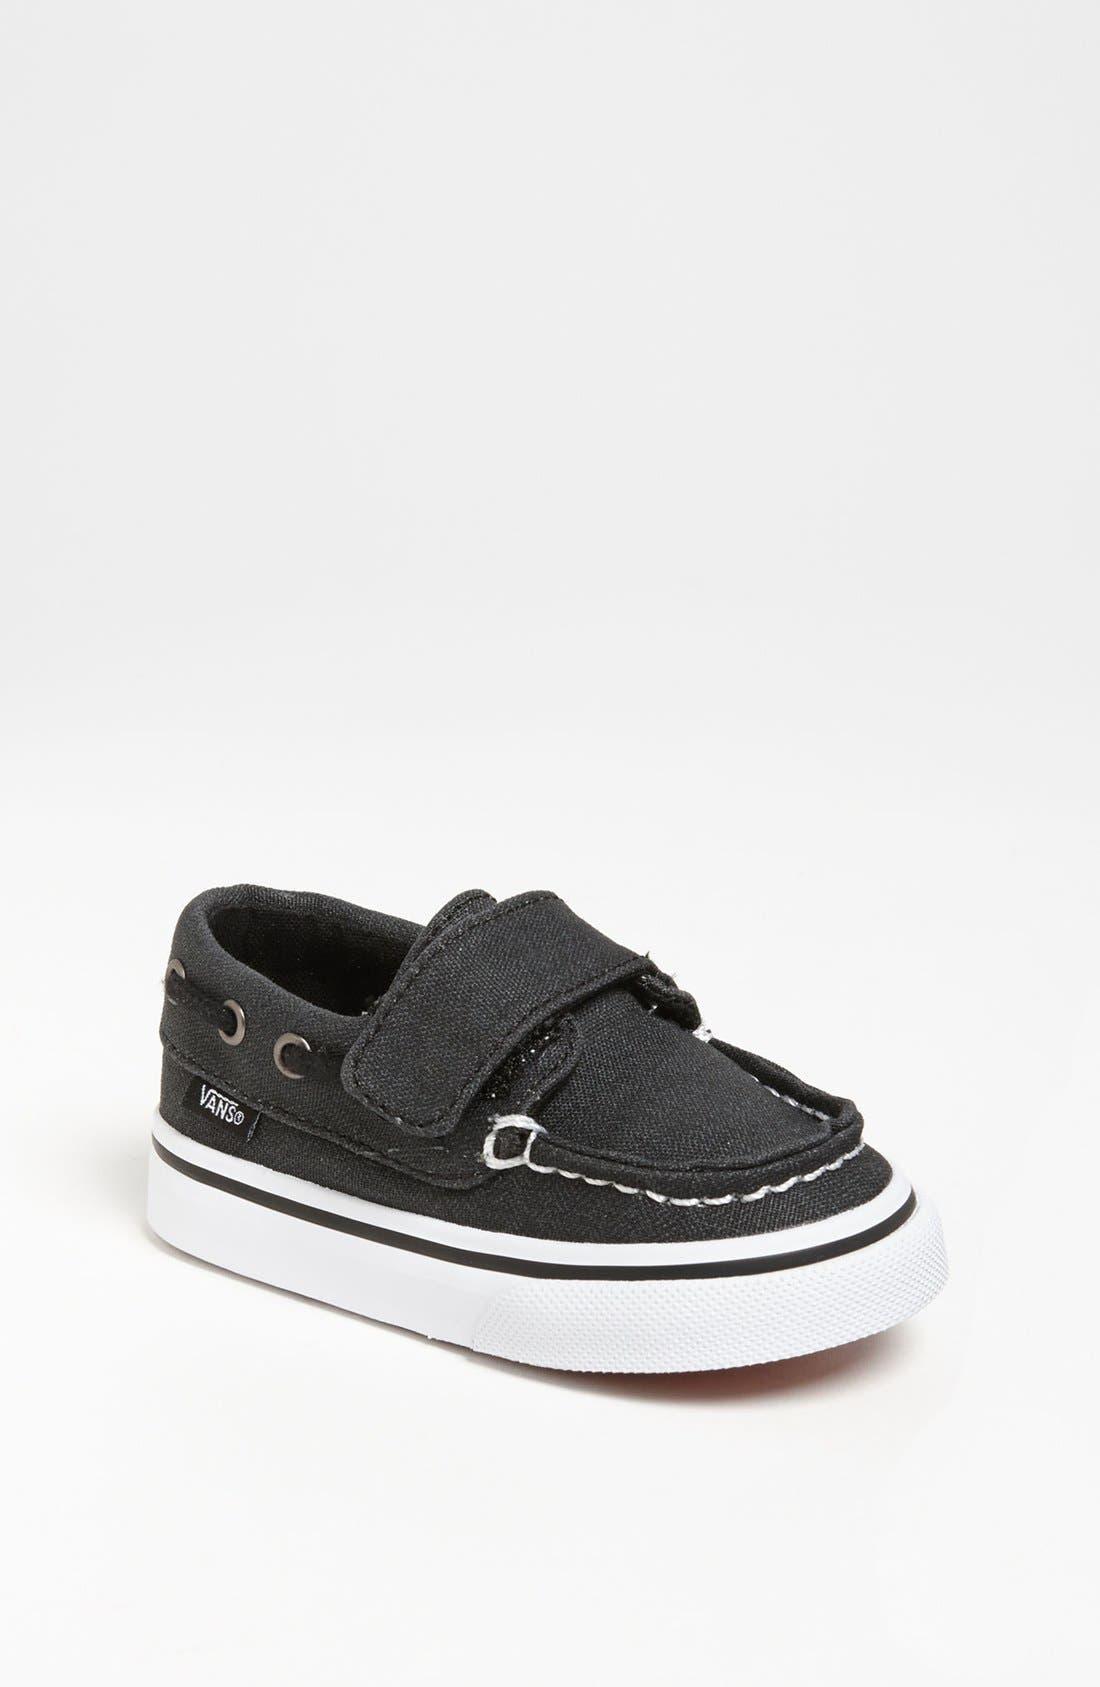 Alternate Image 1 Selected - Vans 'Zapato Del Barco' Sneaker (Baby, Walker & Toddler)